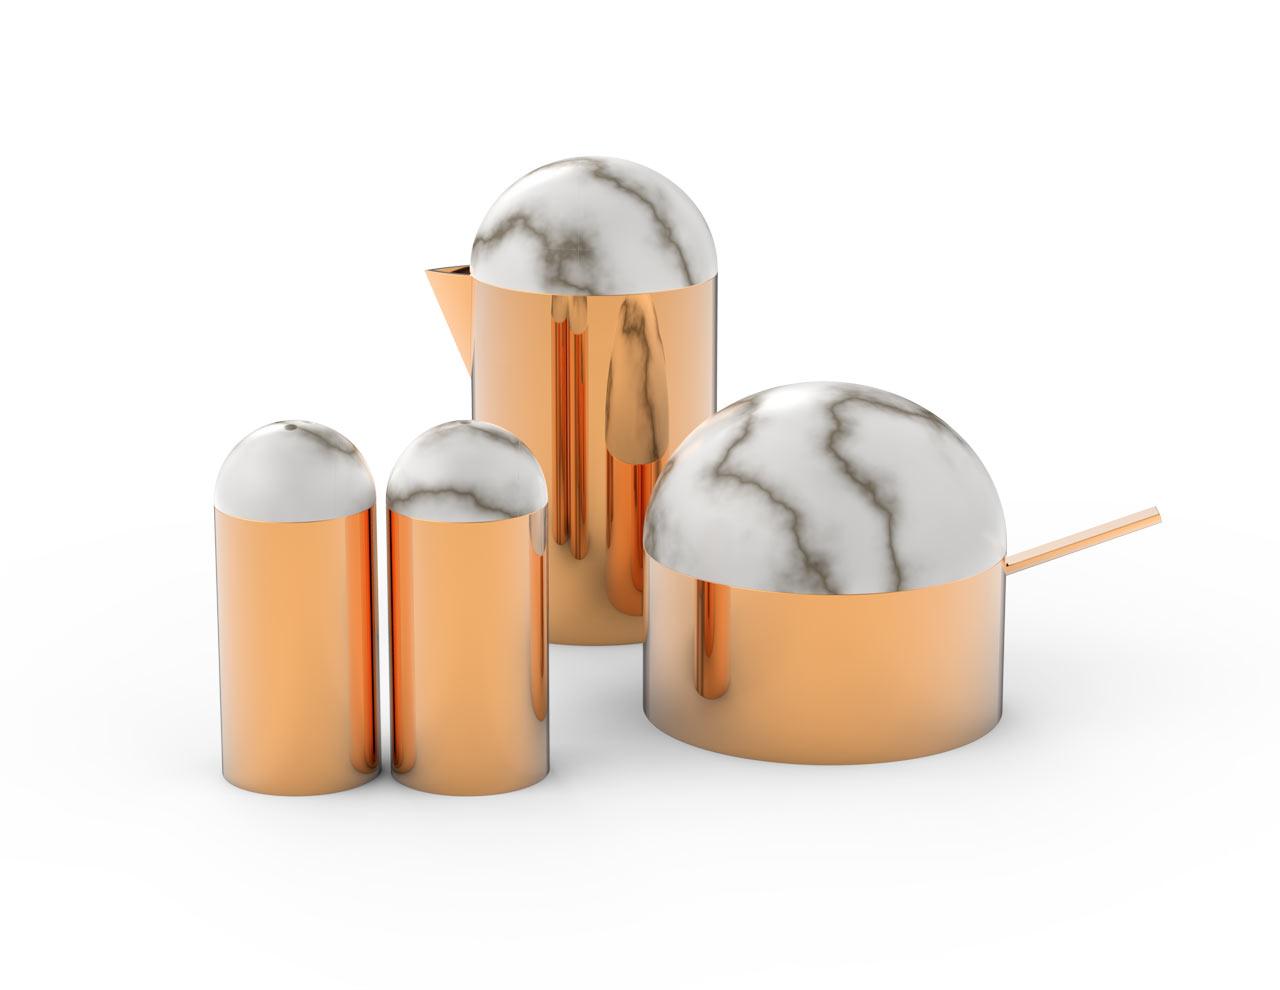 Serving Sets that Combine Metals with Alabaster